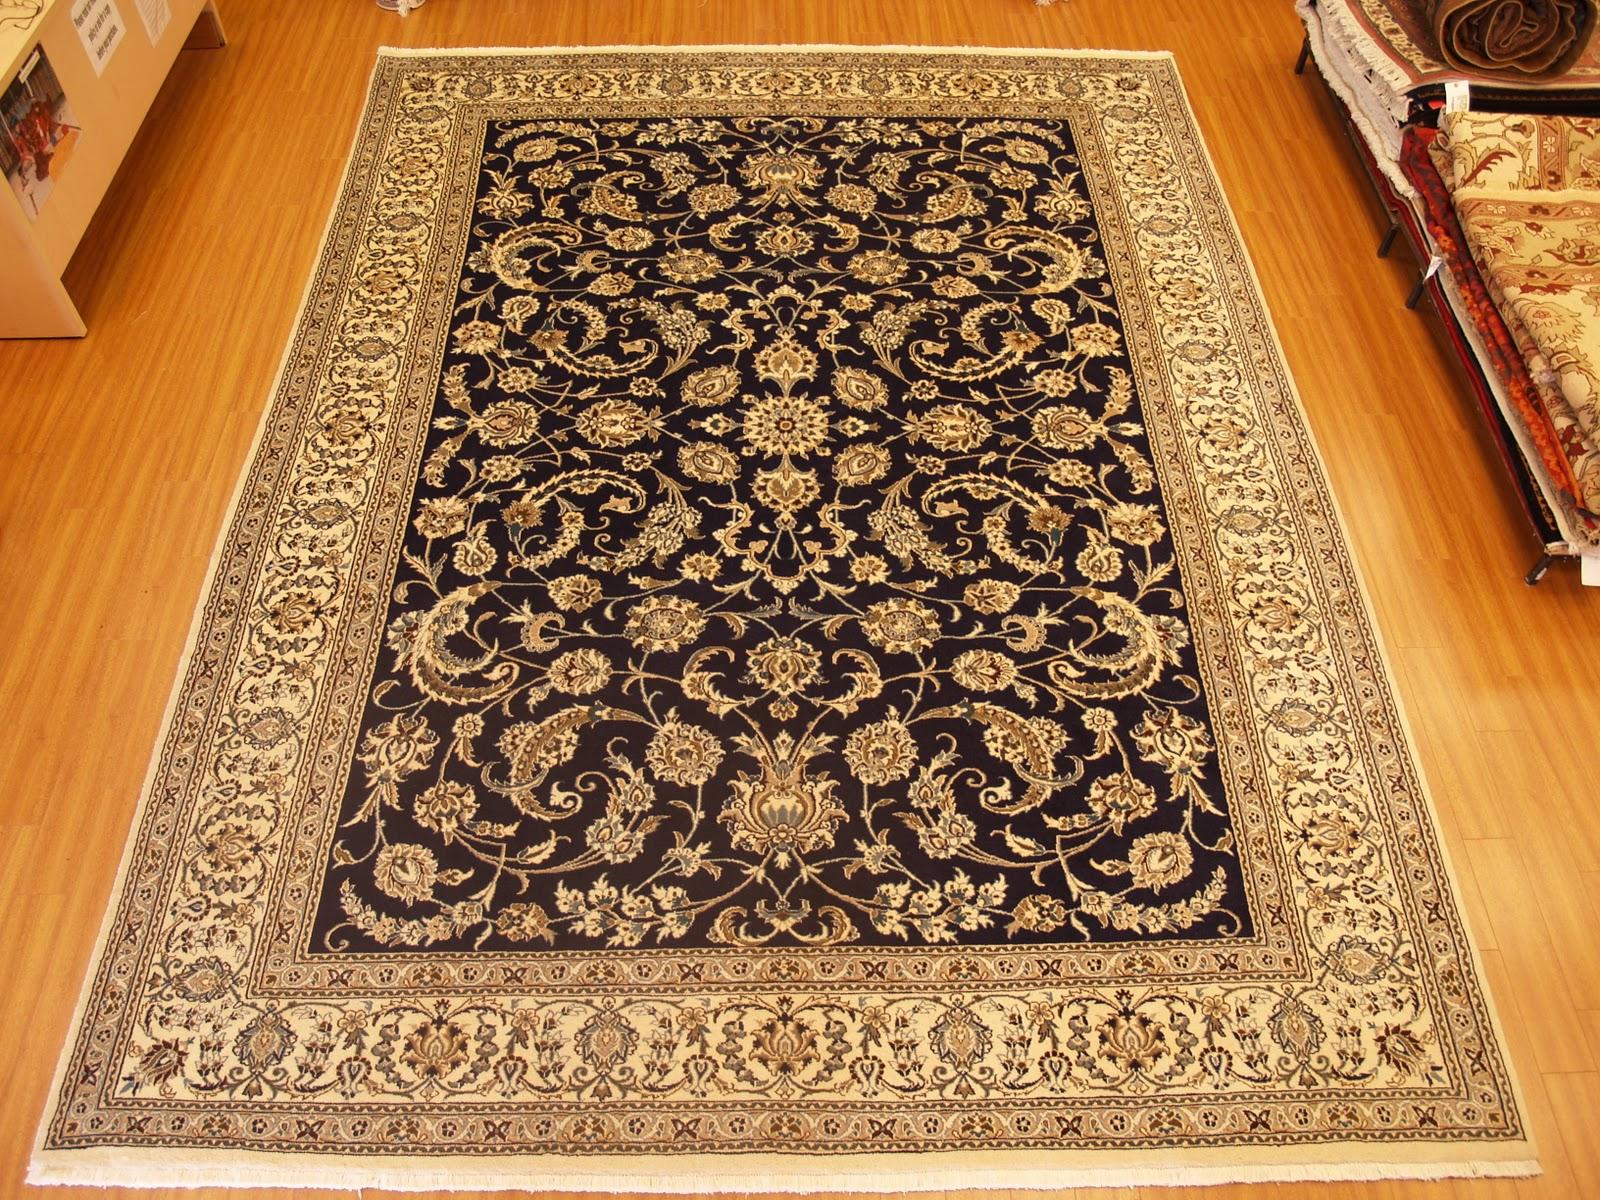 carpet design images modern living room decoration using floral accent carpet designs on  laminate wood PFUFQHJ